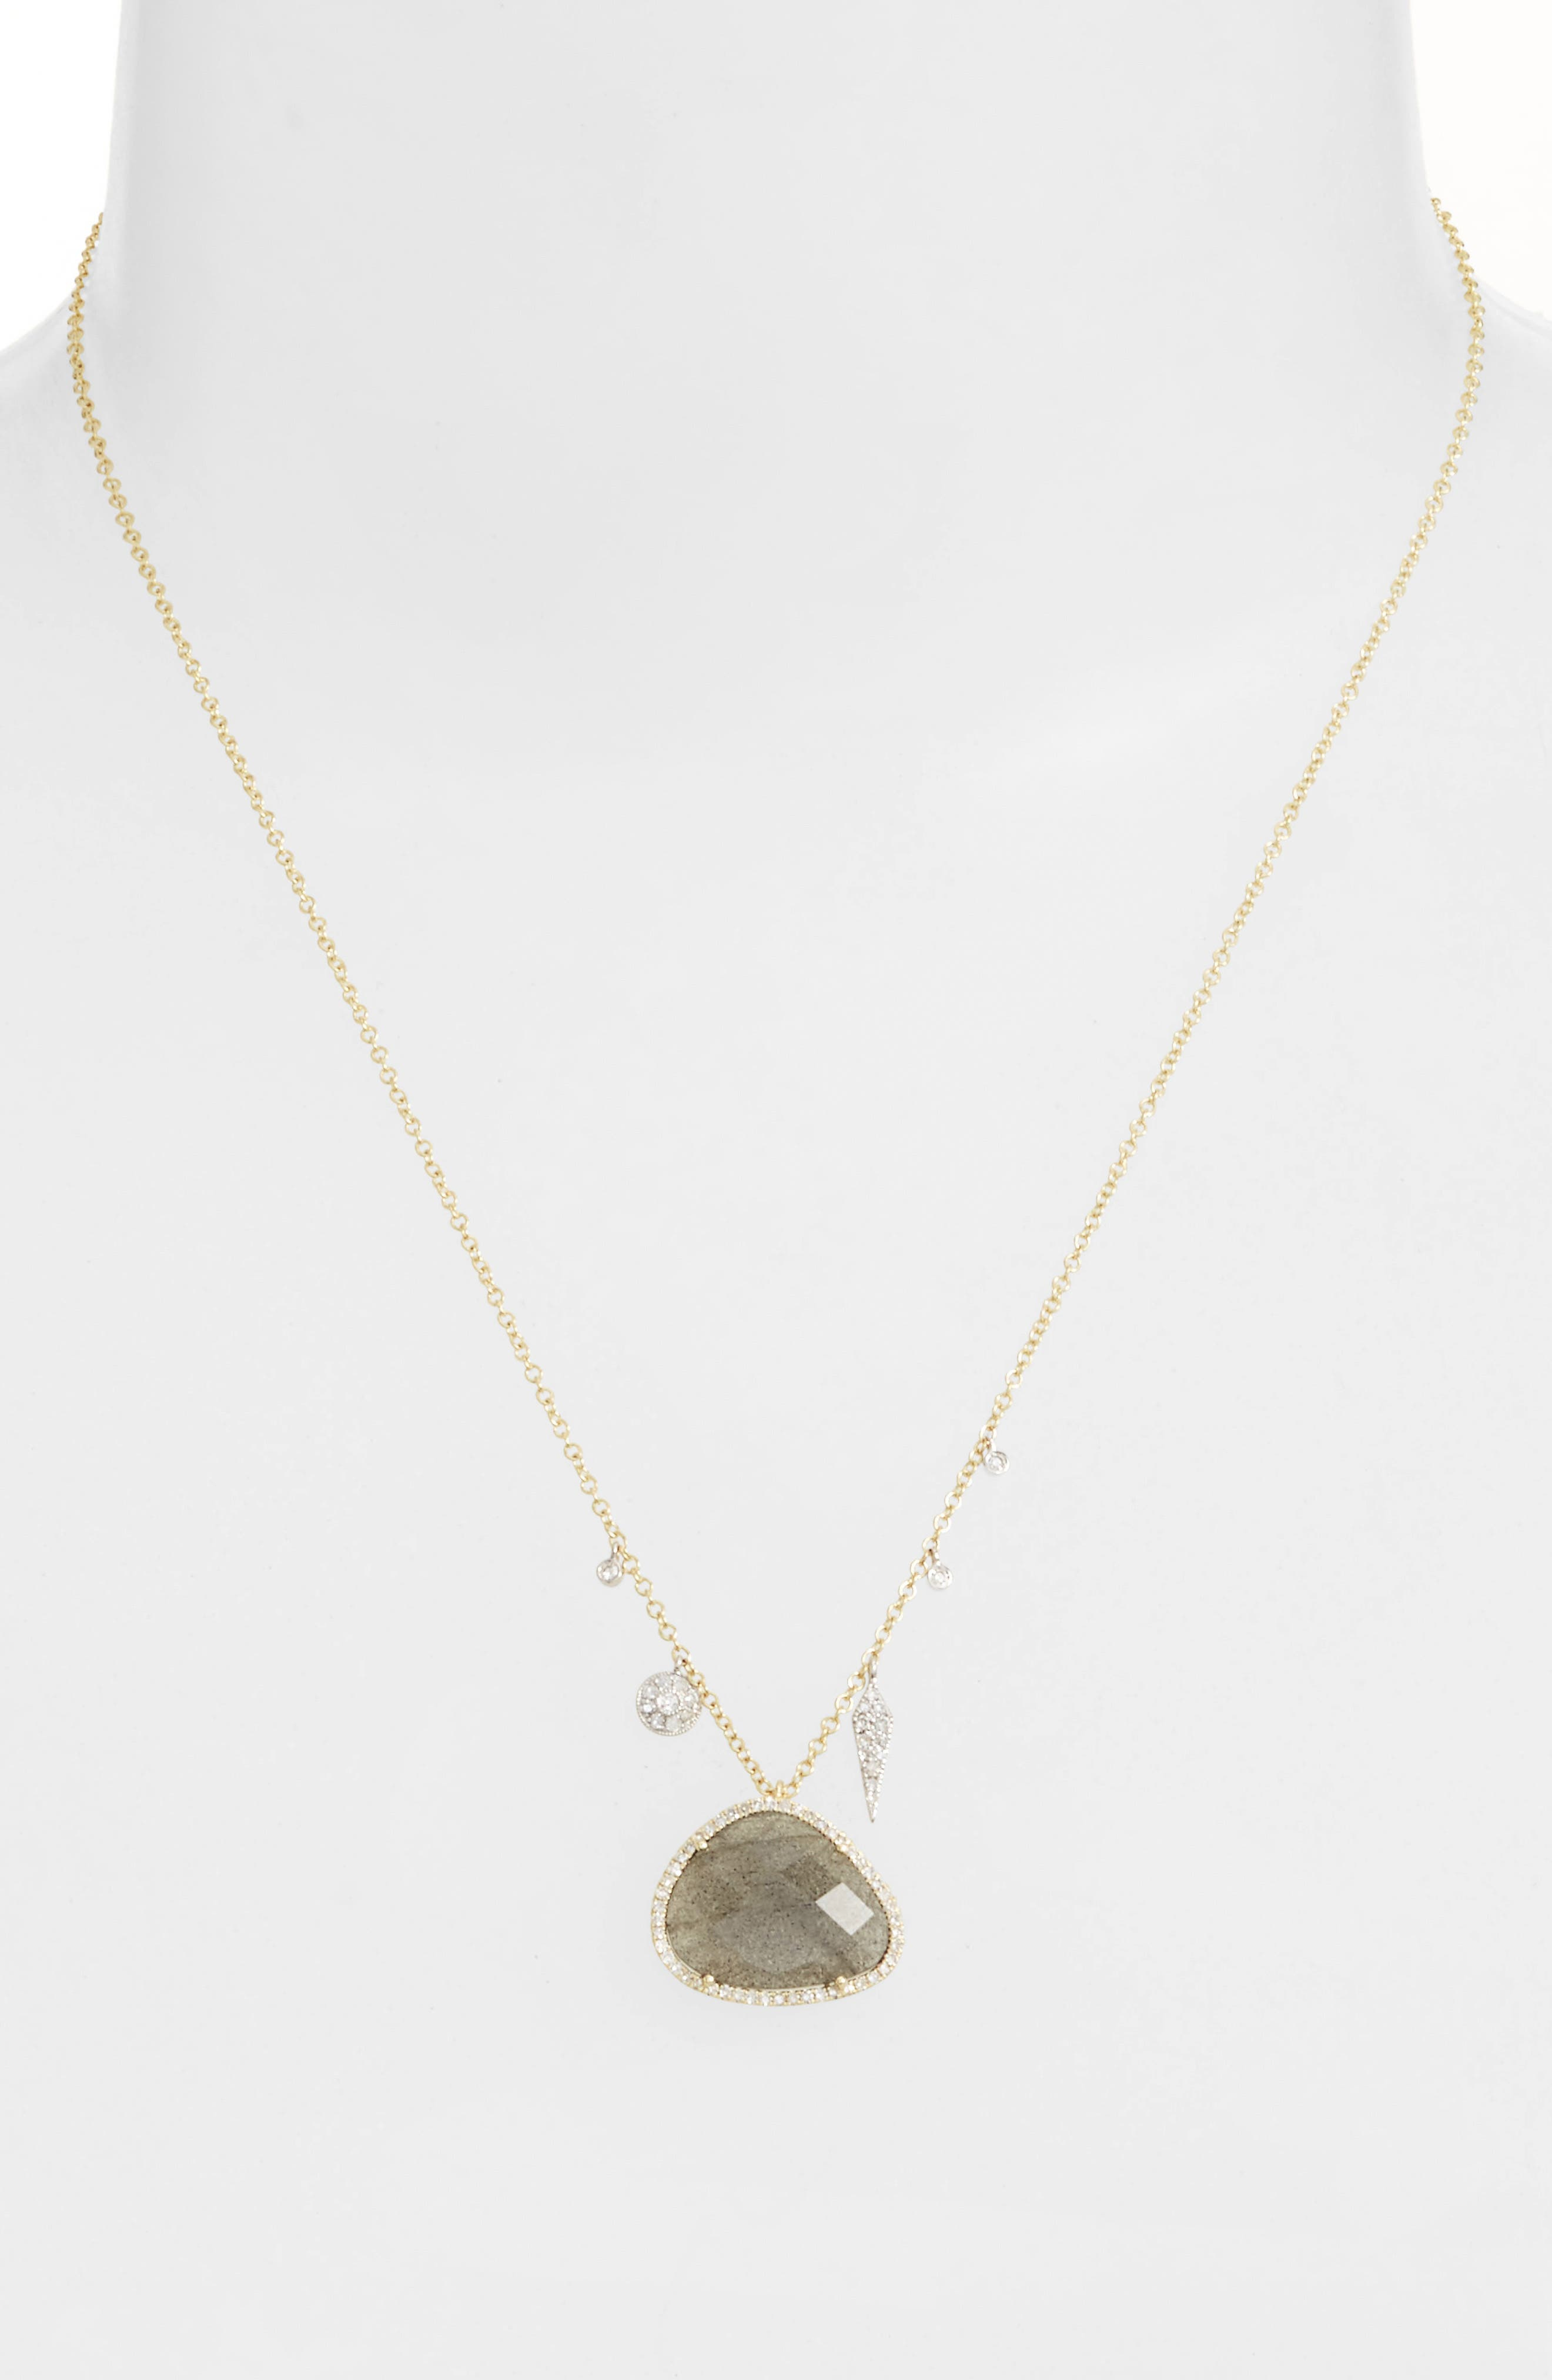 Jewelry Diamond & Semiprecious Stone Pendant Necklace,                             Alternate thumbnail 2, color,                             710